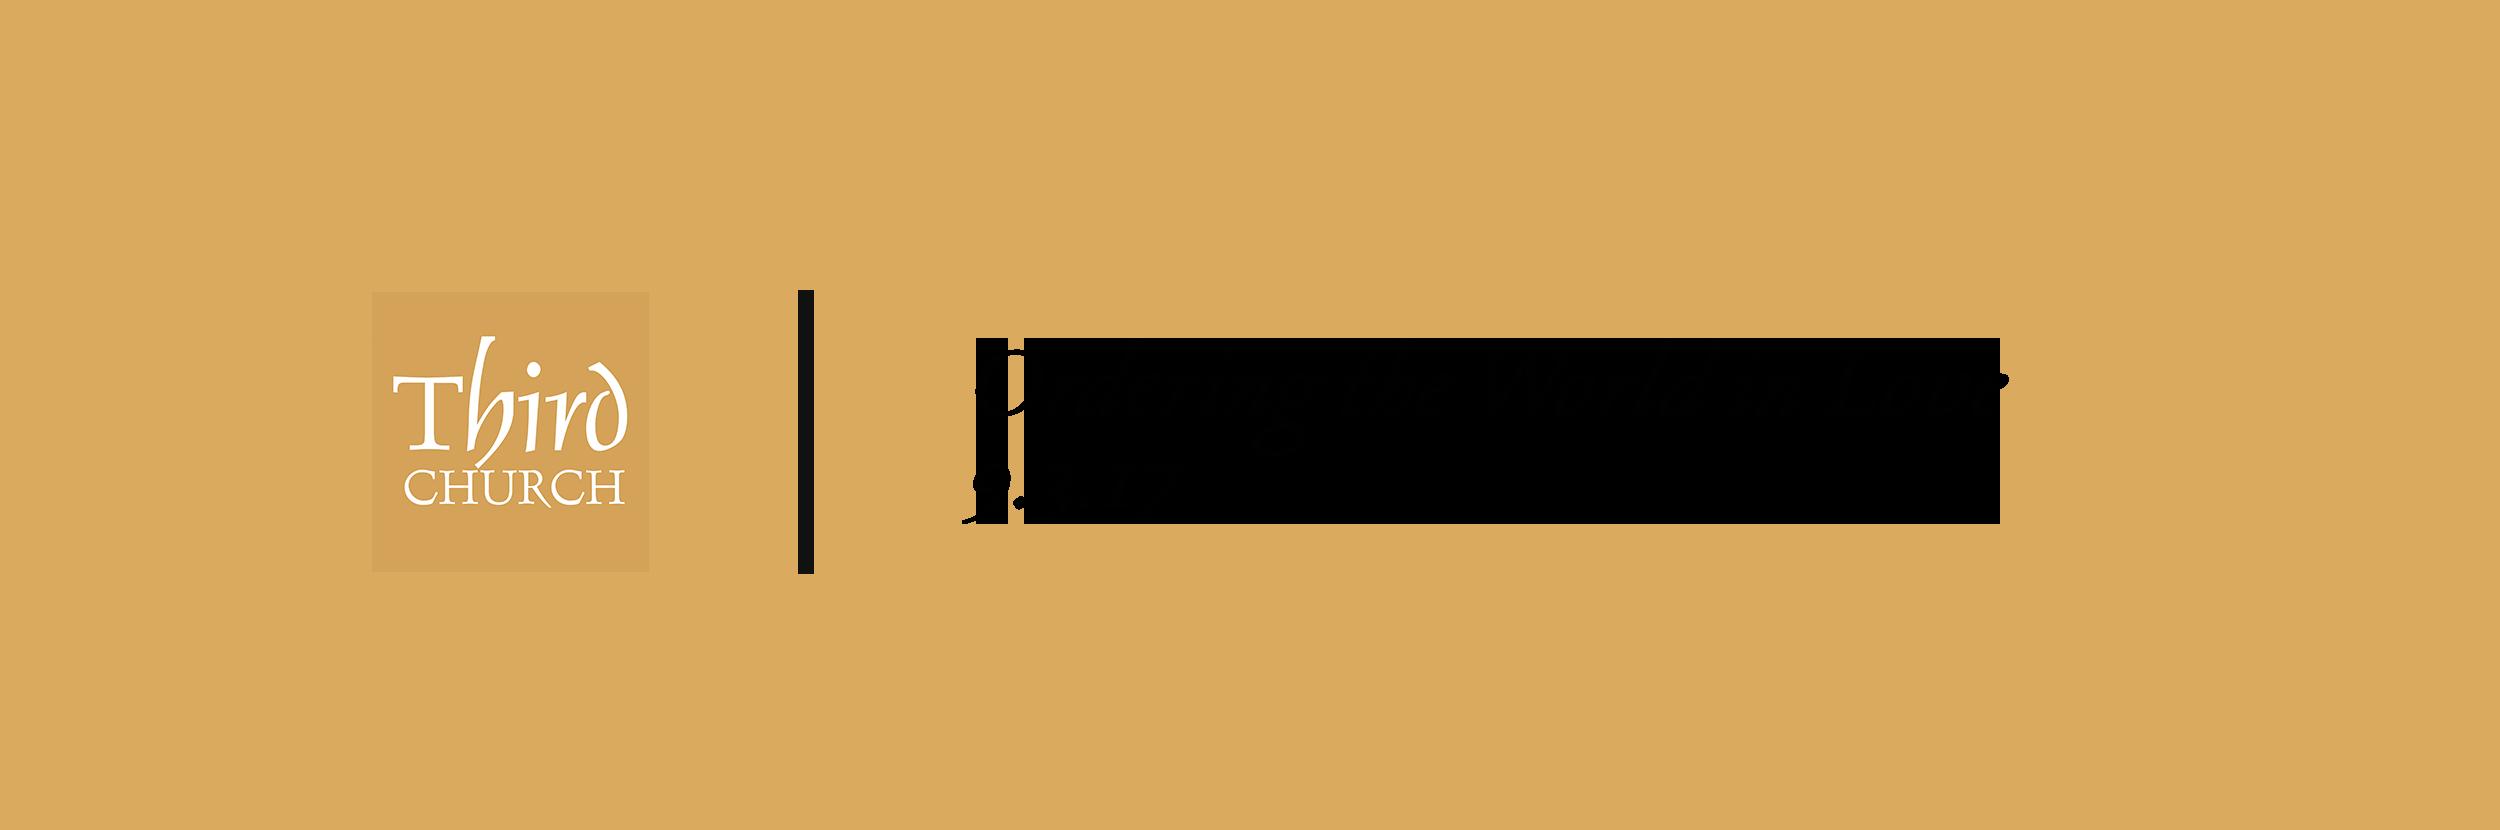 090317 Third Logo Sermon Banner.png